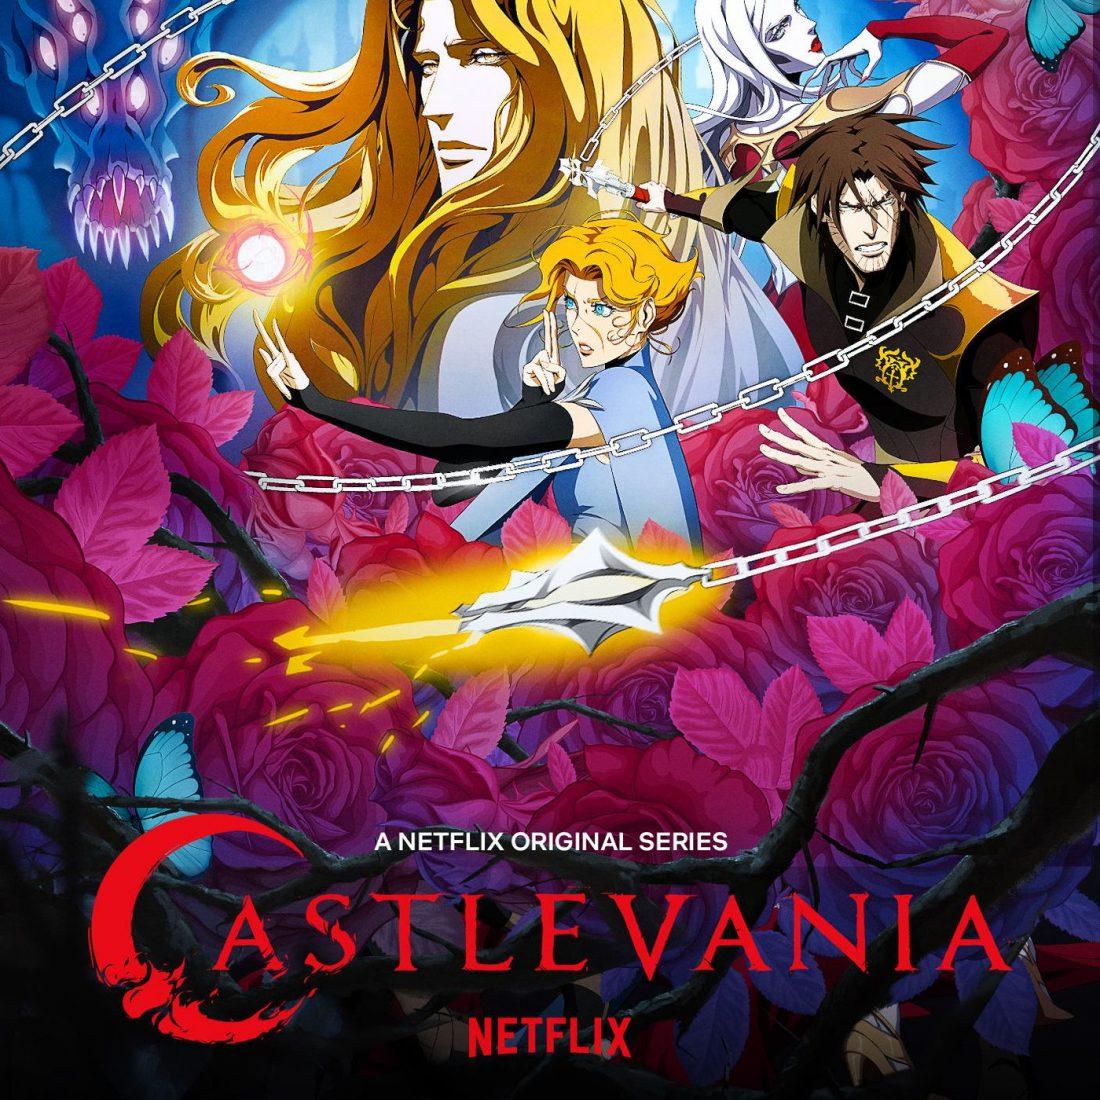 Upcoming Anime On Netflix